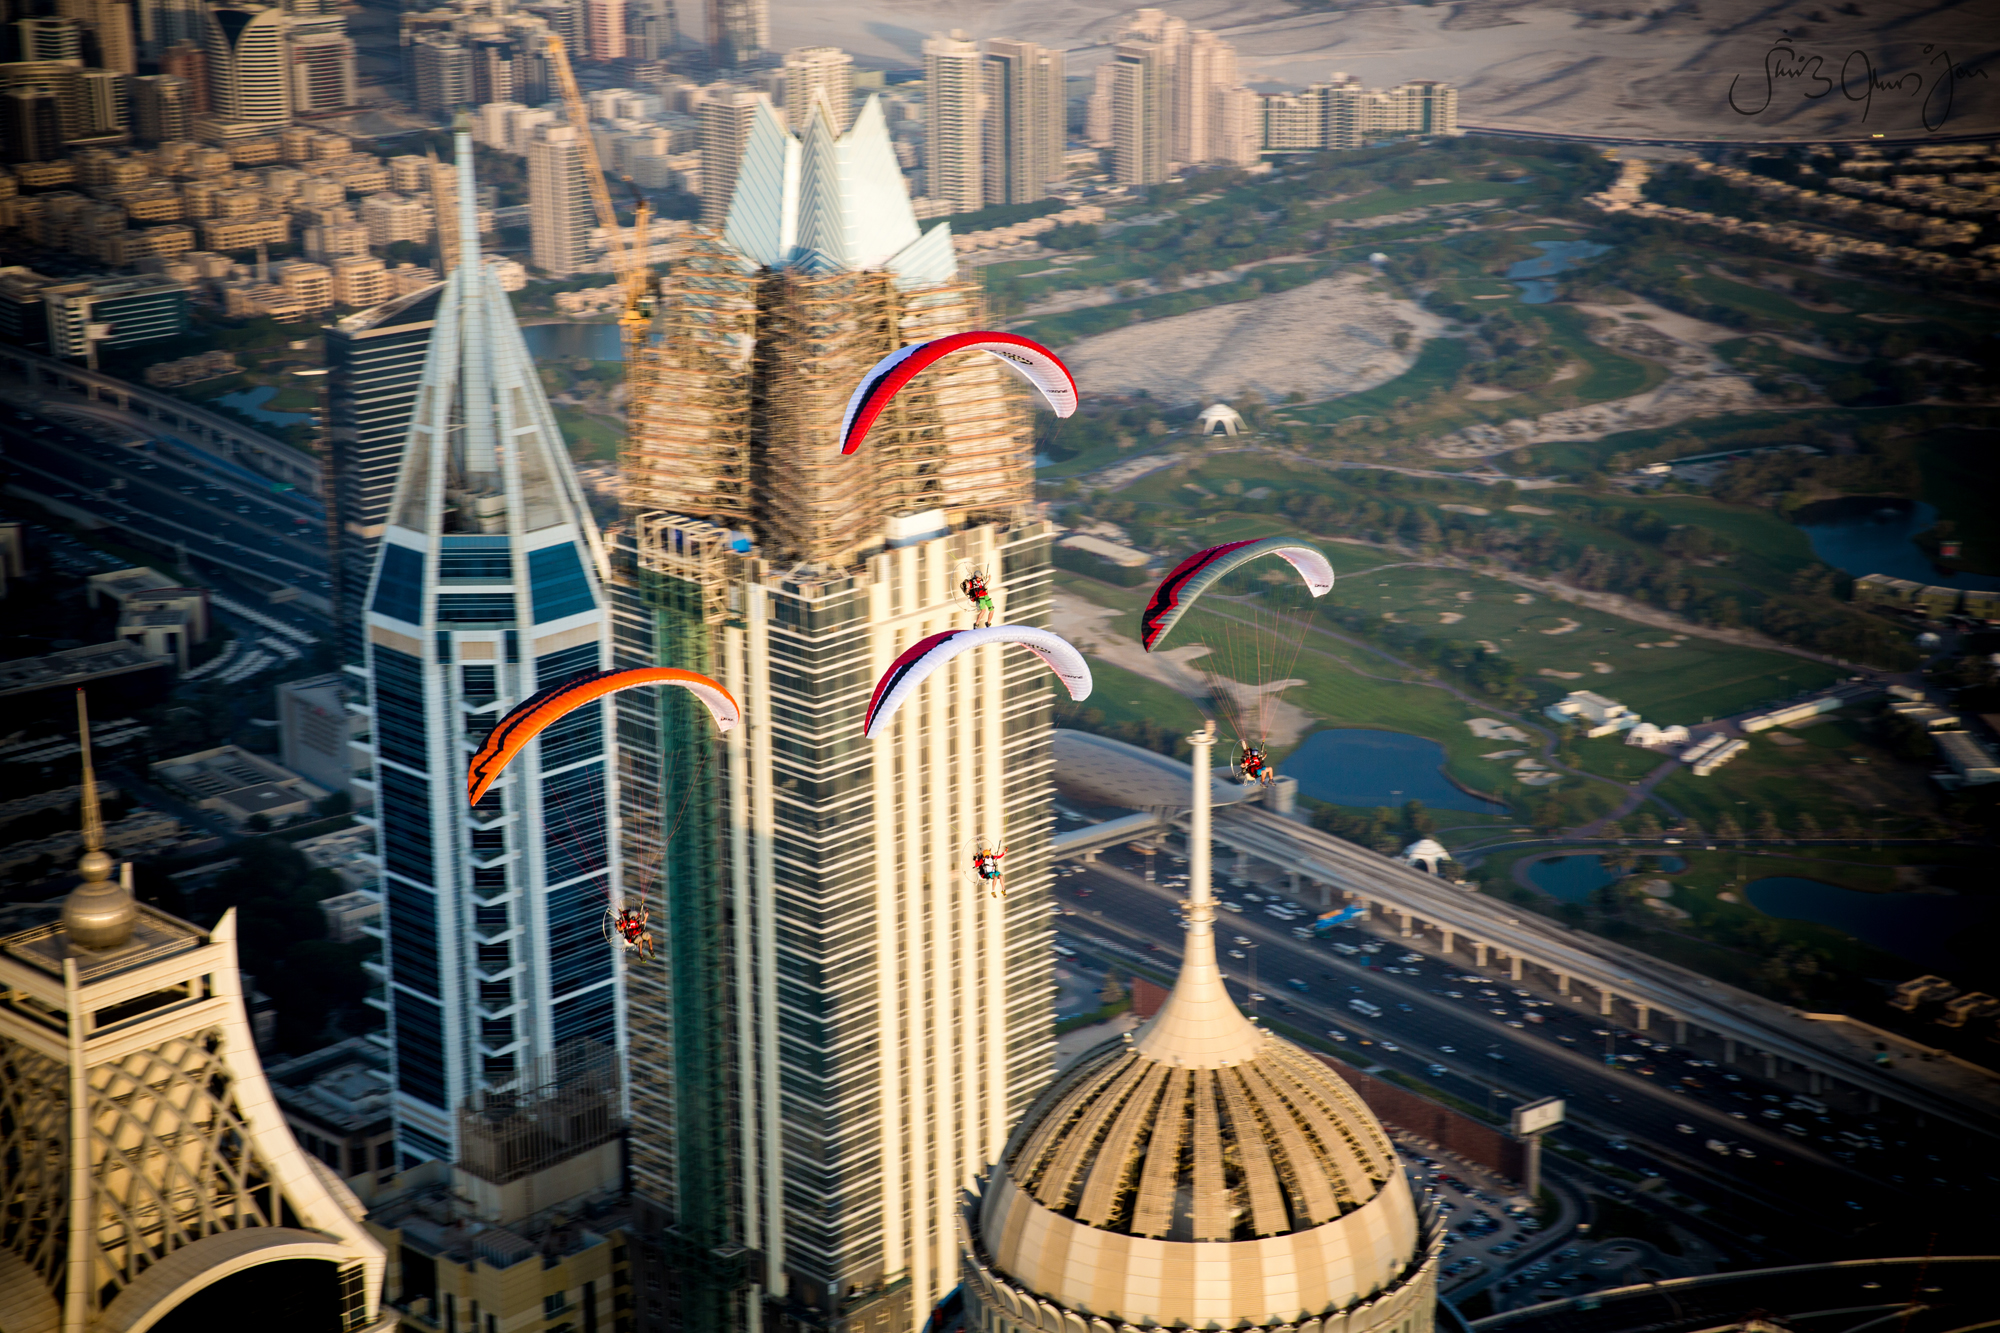 WTB-6275 Skyhub paramotors Palm Dubai marina Francois ragolski Martin schricke